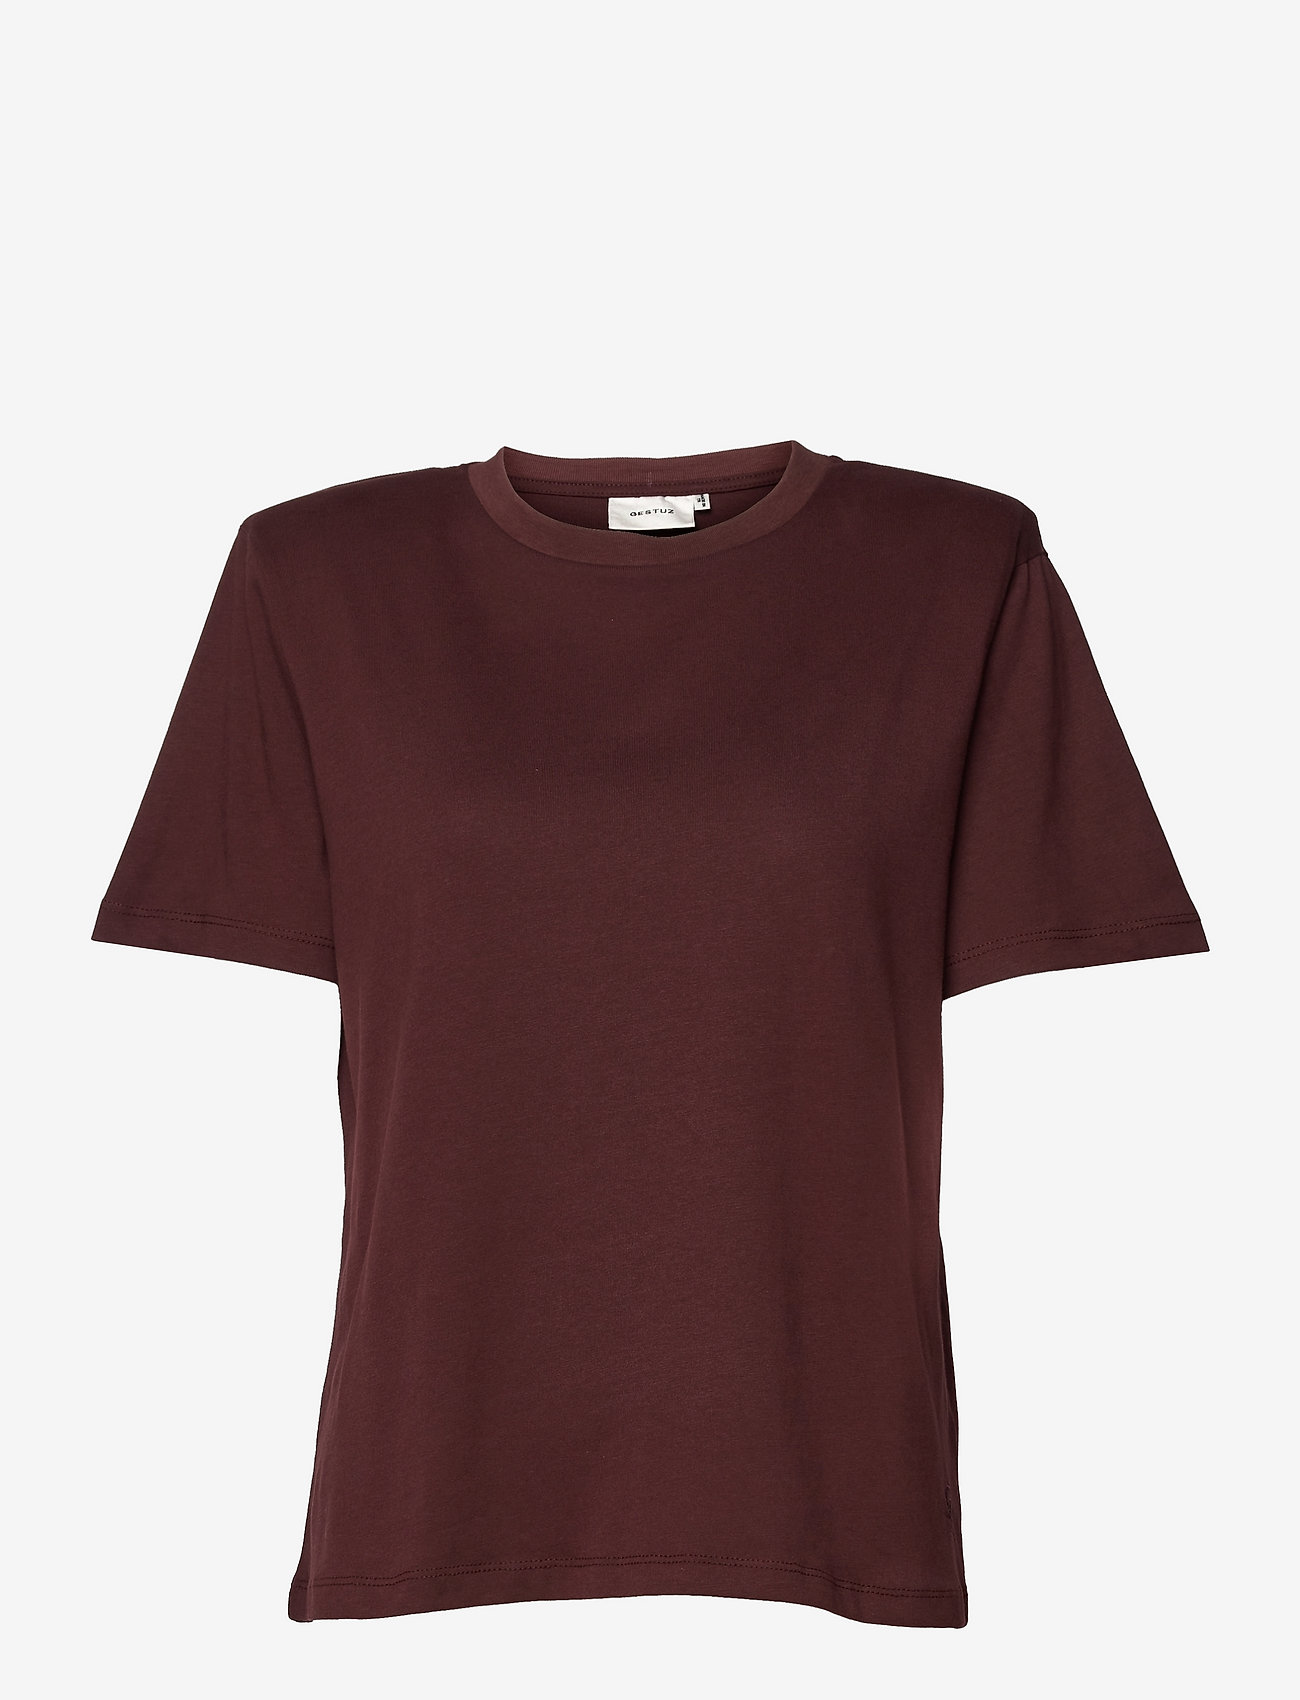 Gestuz - JoryGZ tee - t-shirts - decadent chocolate - 0